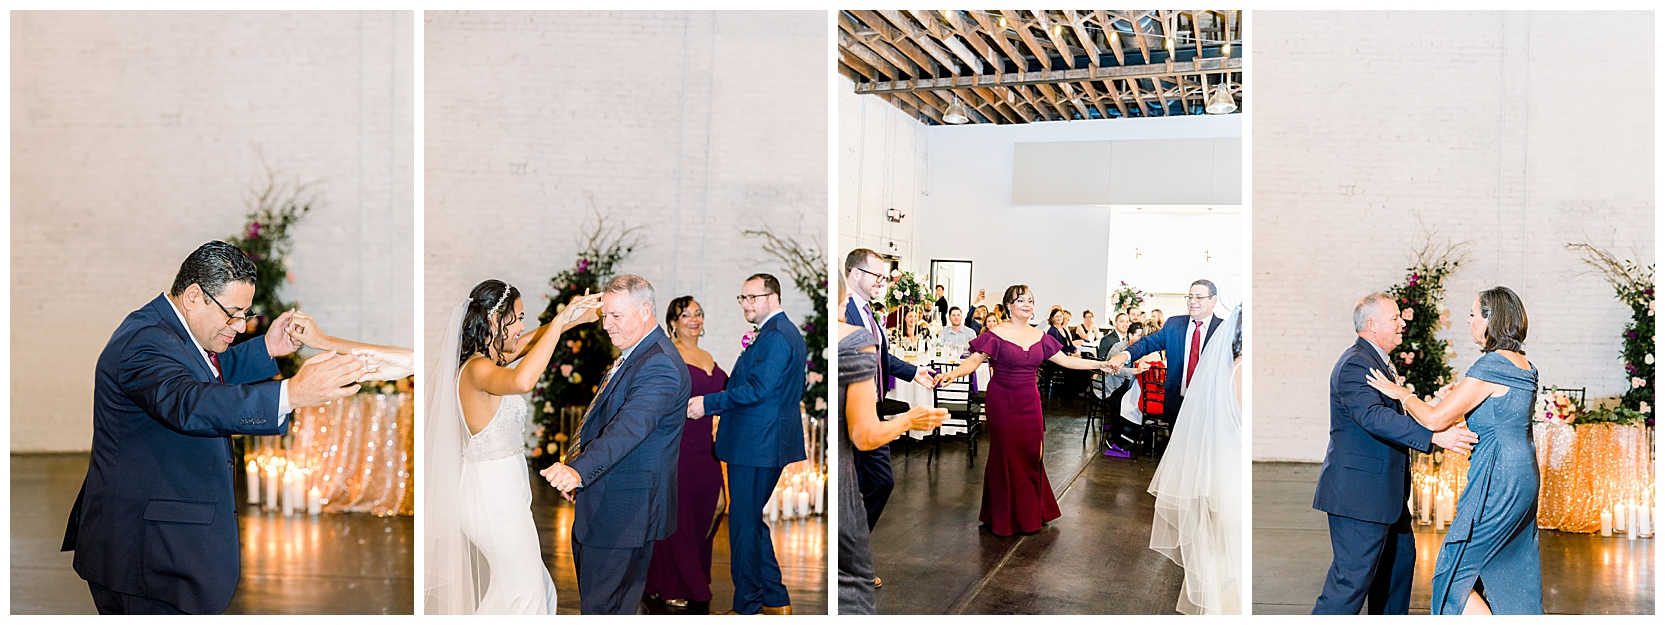 jessicafredericks_lakeland_tampa_wedding_purple_crazy hour_0075.jpg